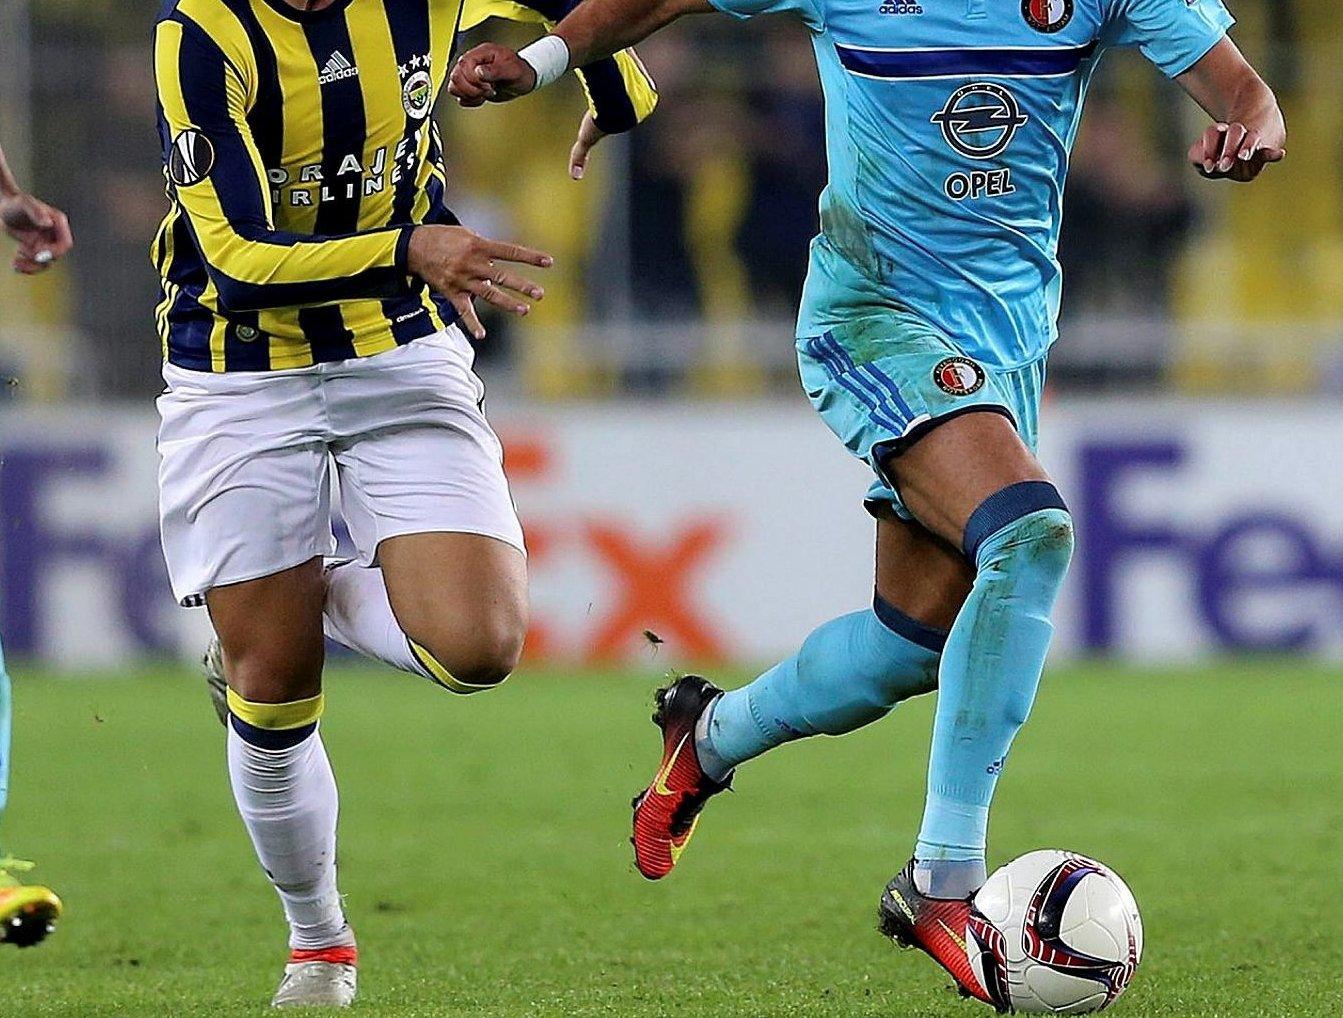 CANLI | Feyenoord-Fenerbahçe (İlk 11'ler)